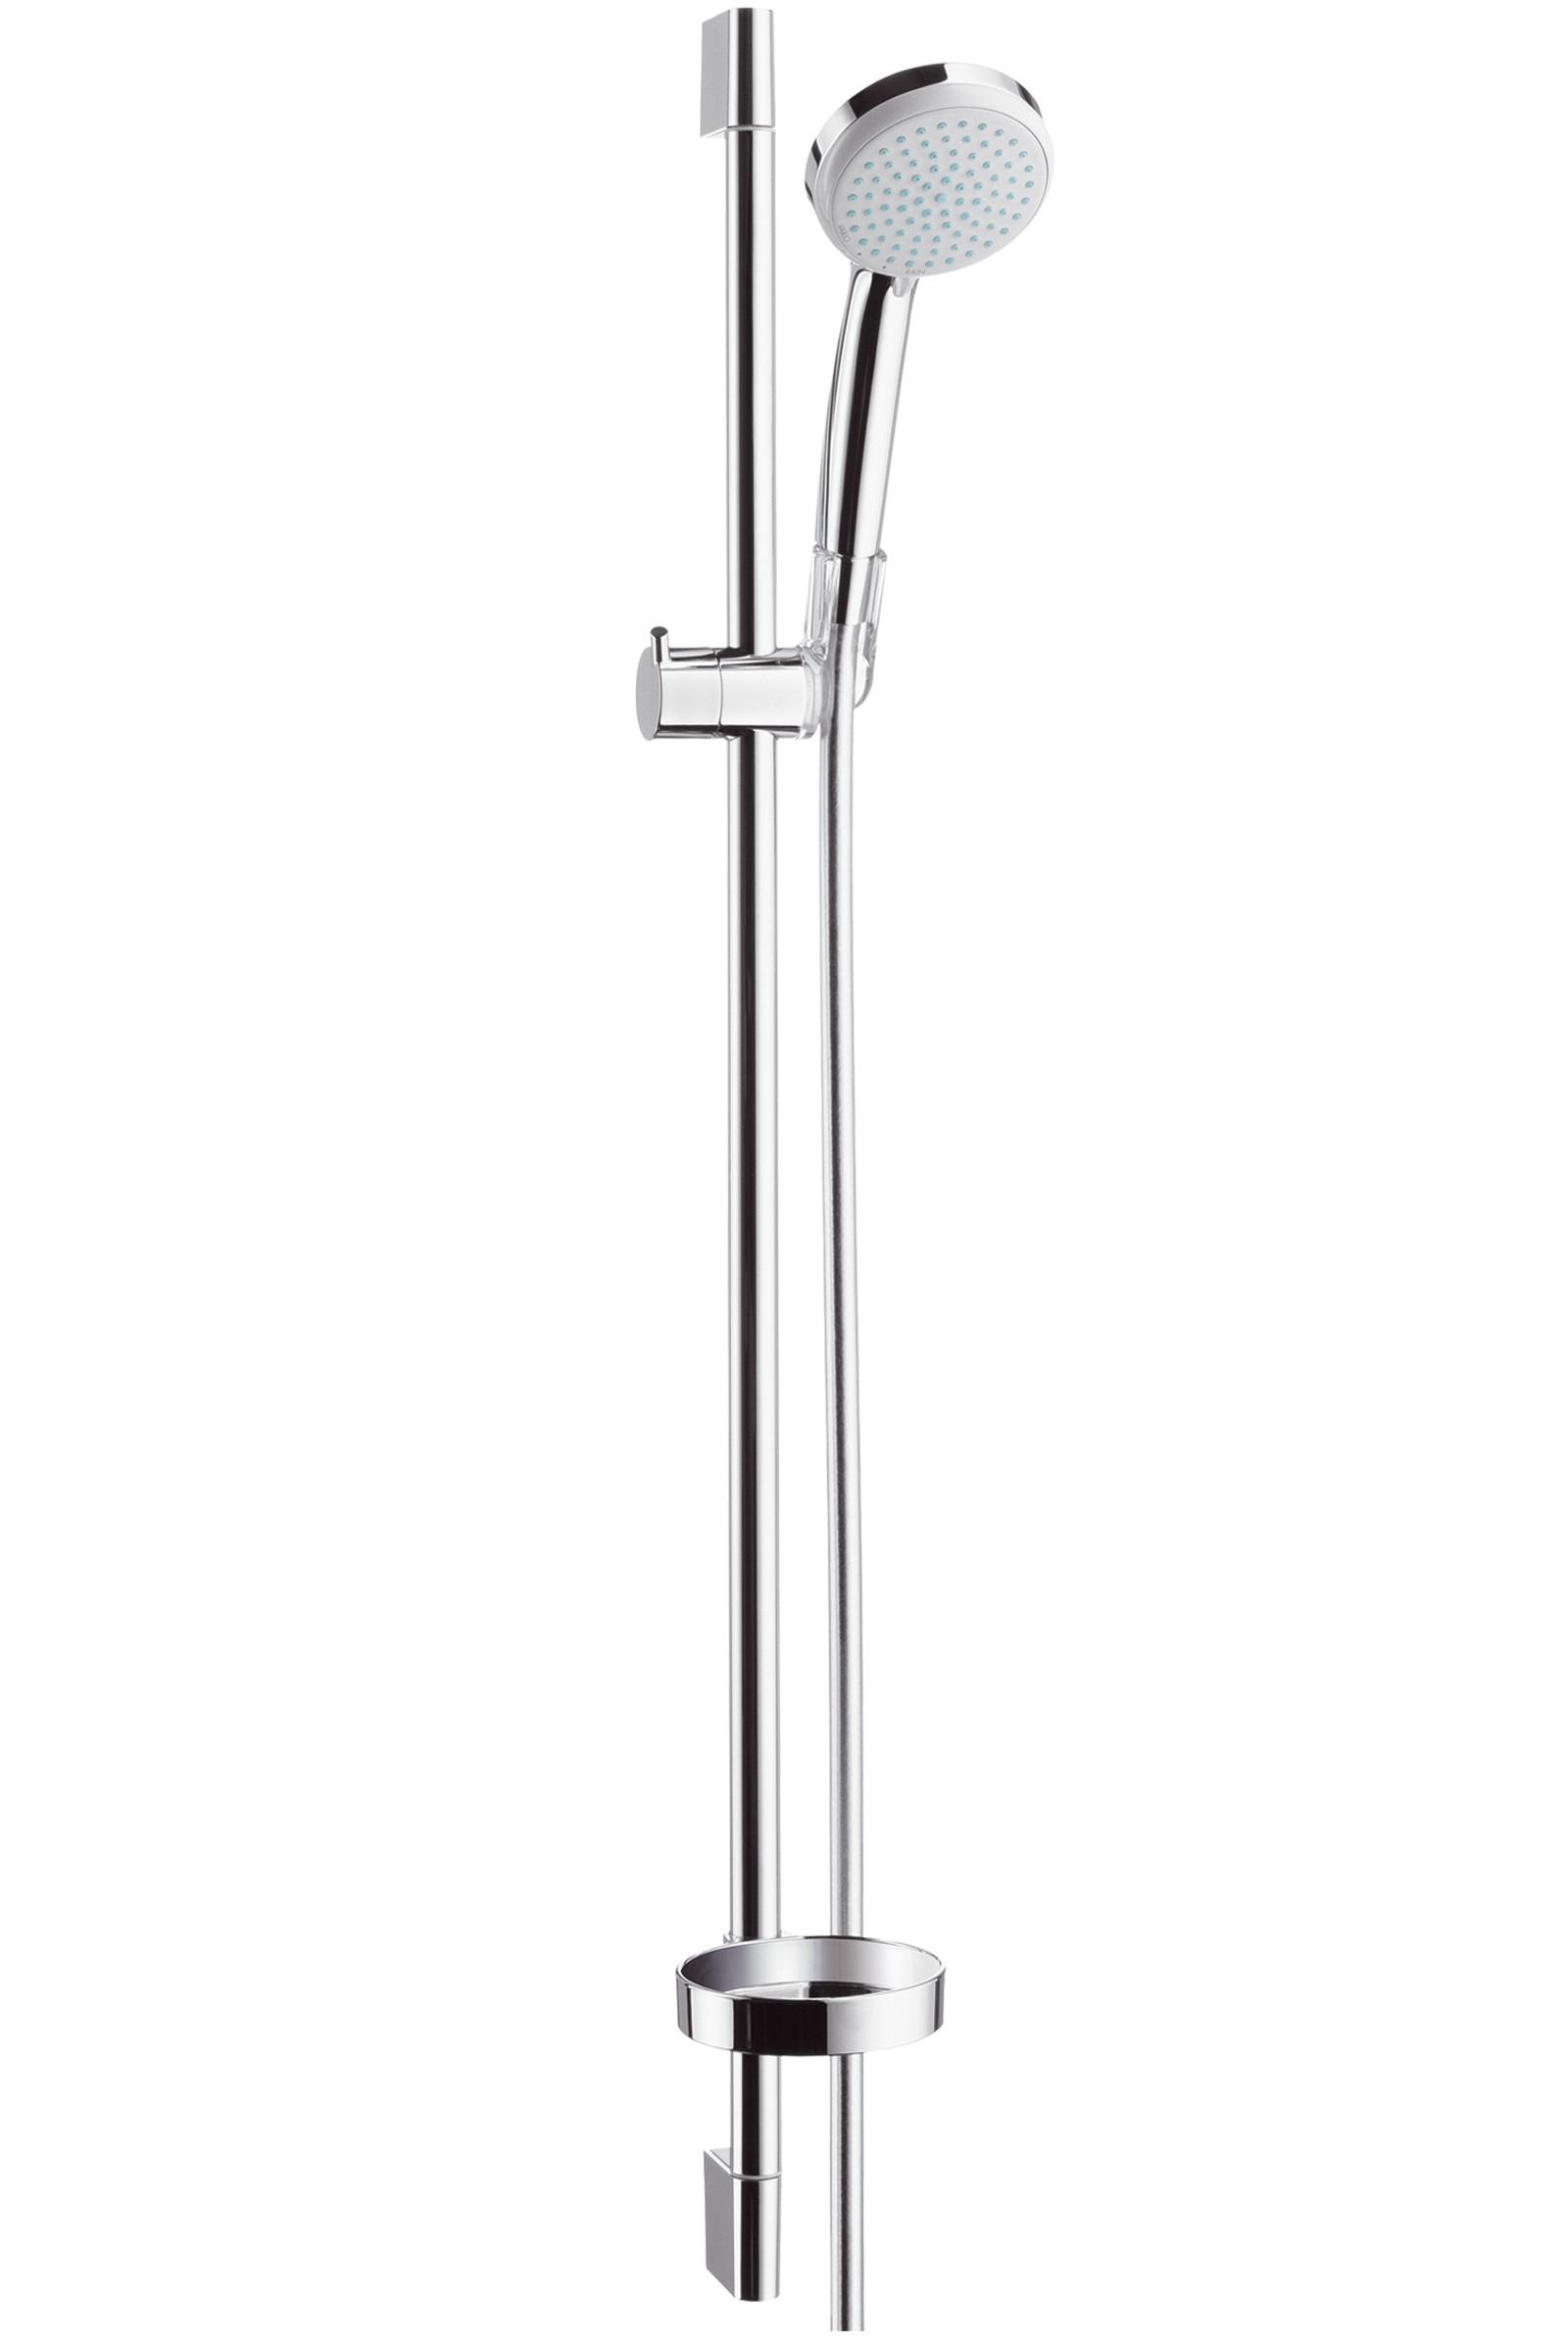 HG Brausenset Croma 100 Vario/Unica'C